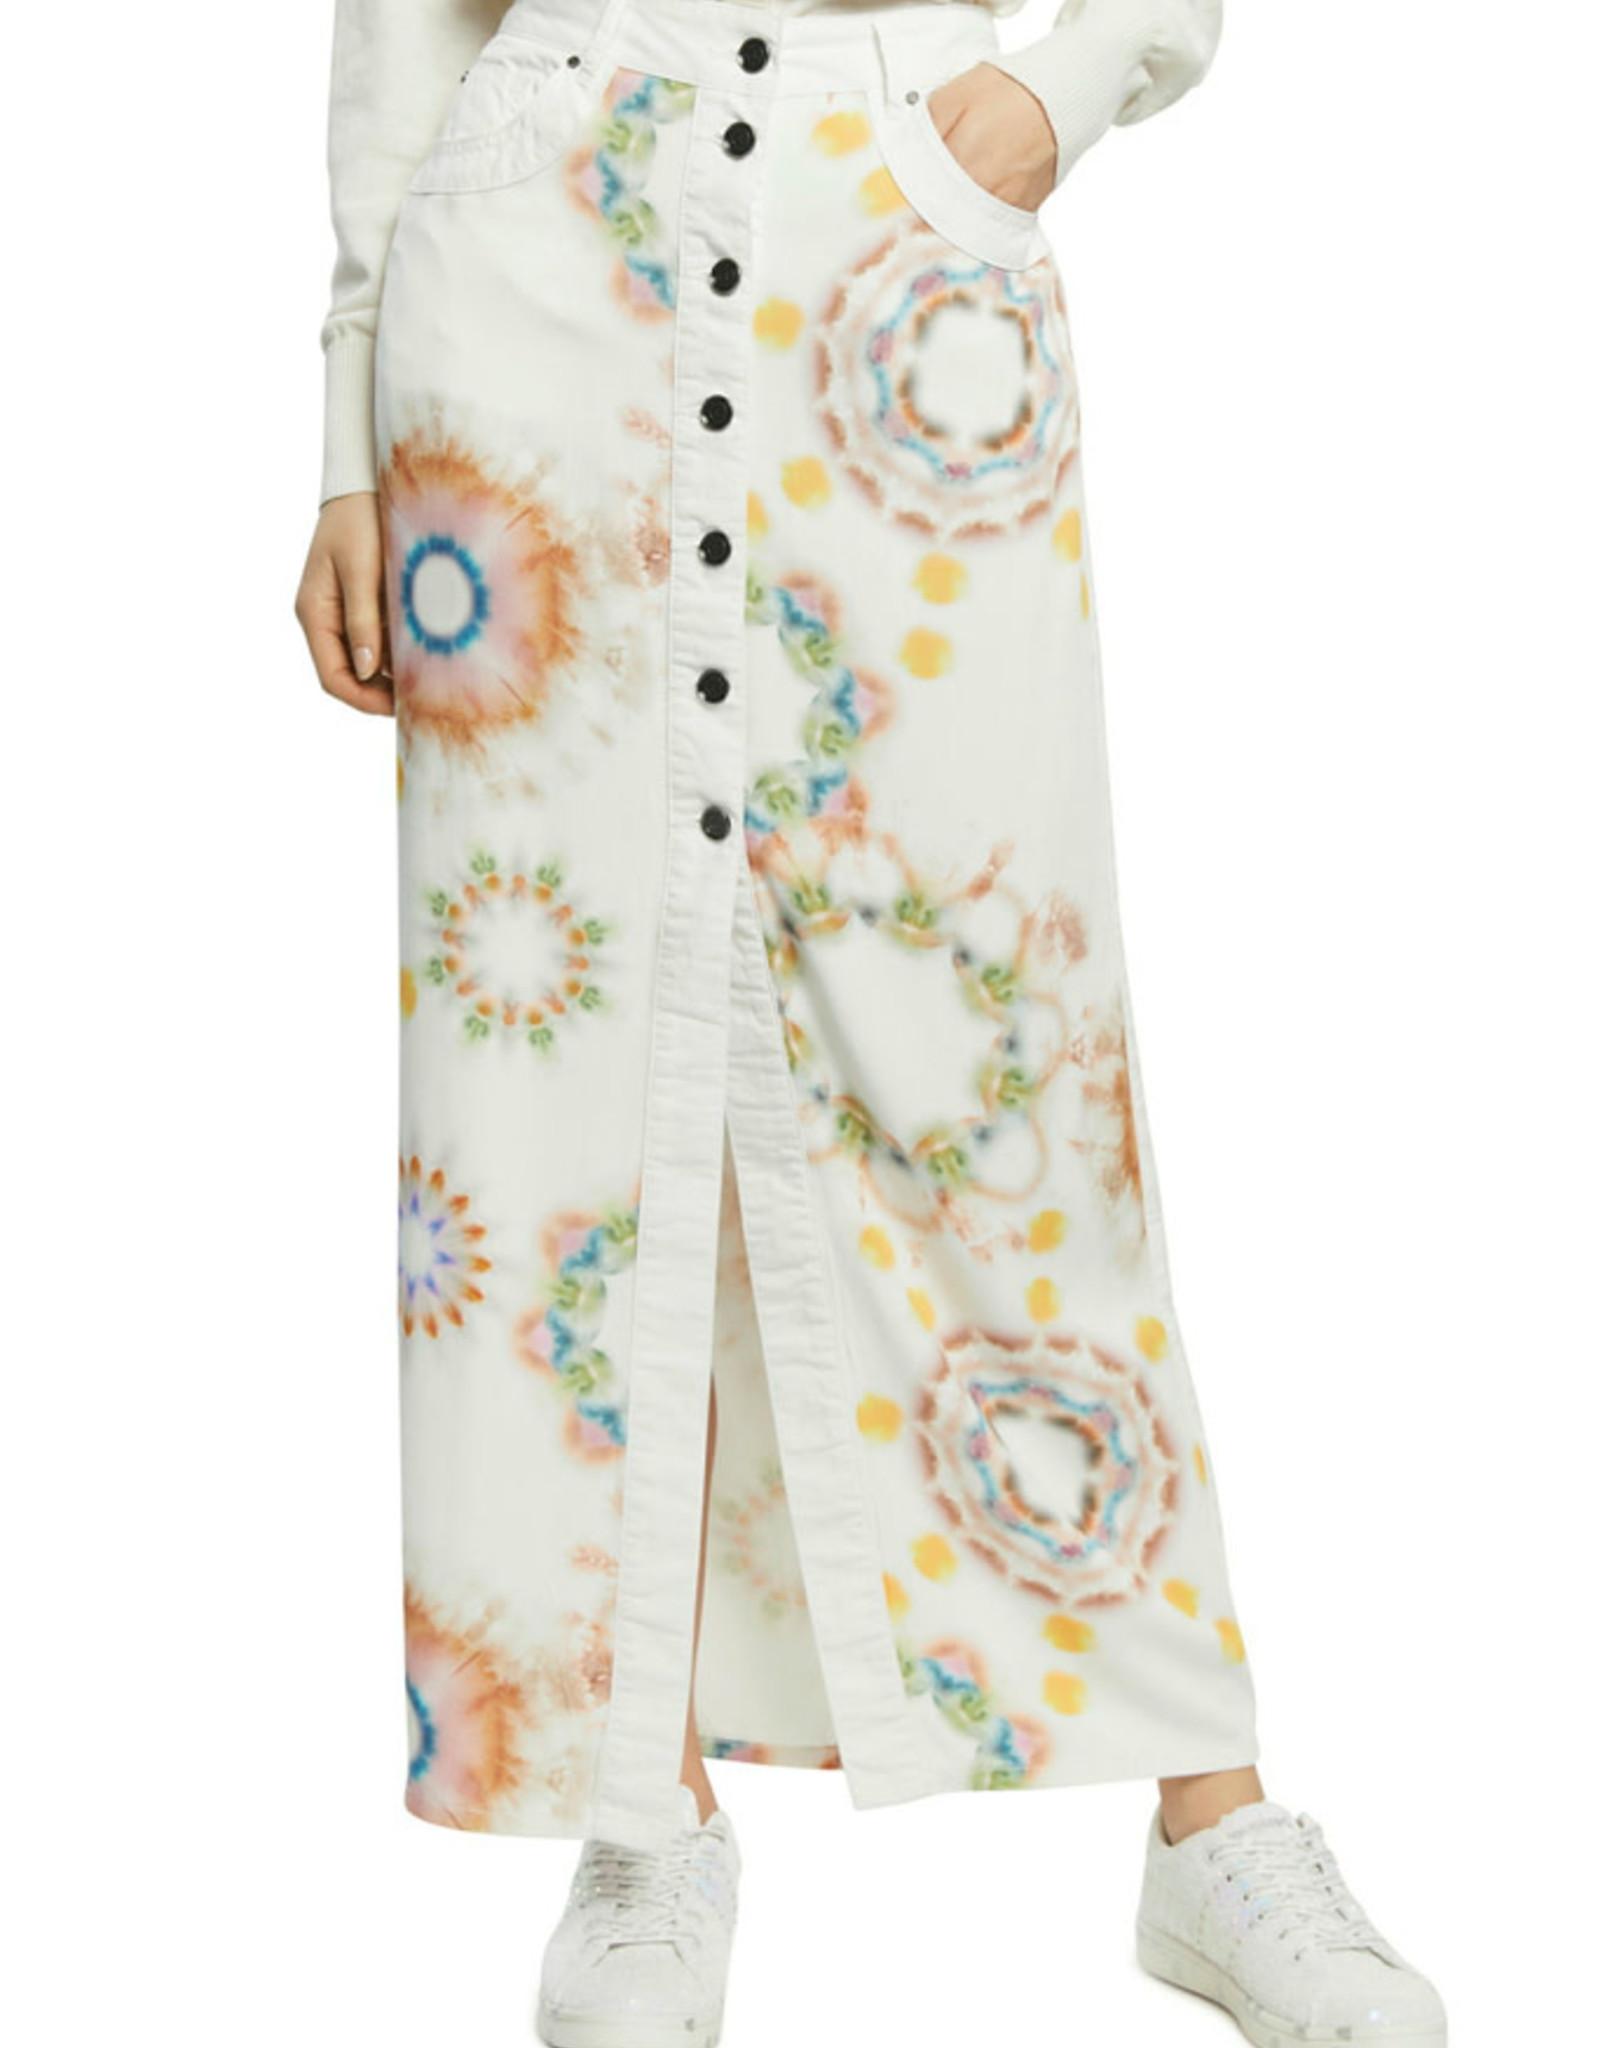 DESIG 21SWFW17 1010 Sunny Day Long Skirt